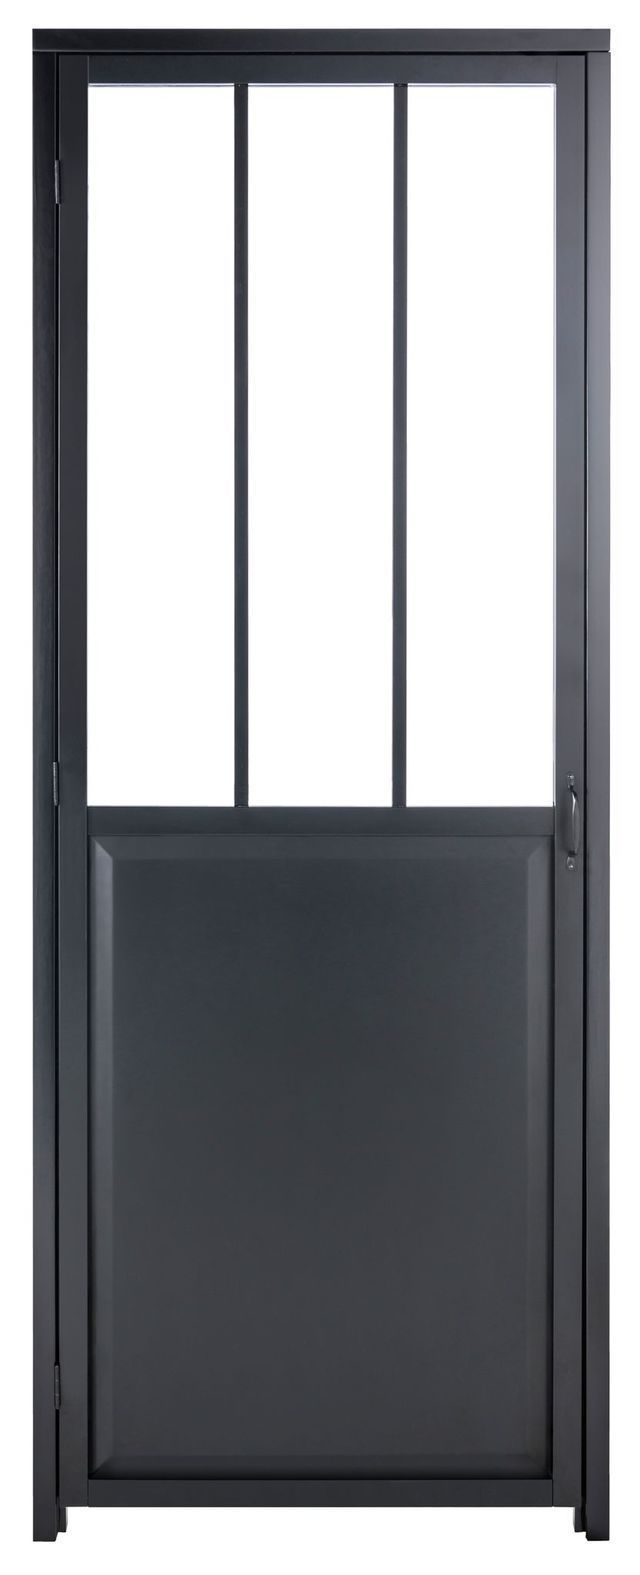 New Leroy Merlin 2016 With Images Aluminium Sliding Doors Sliding Doors Tile Bathroom